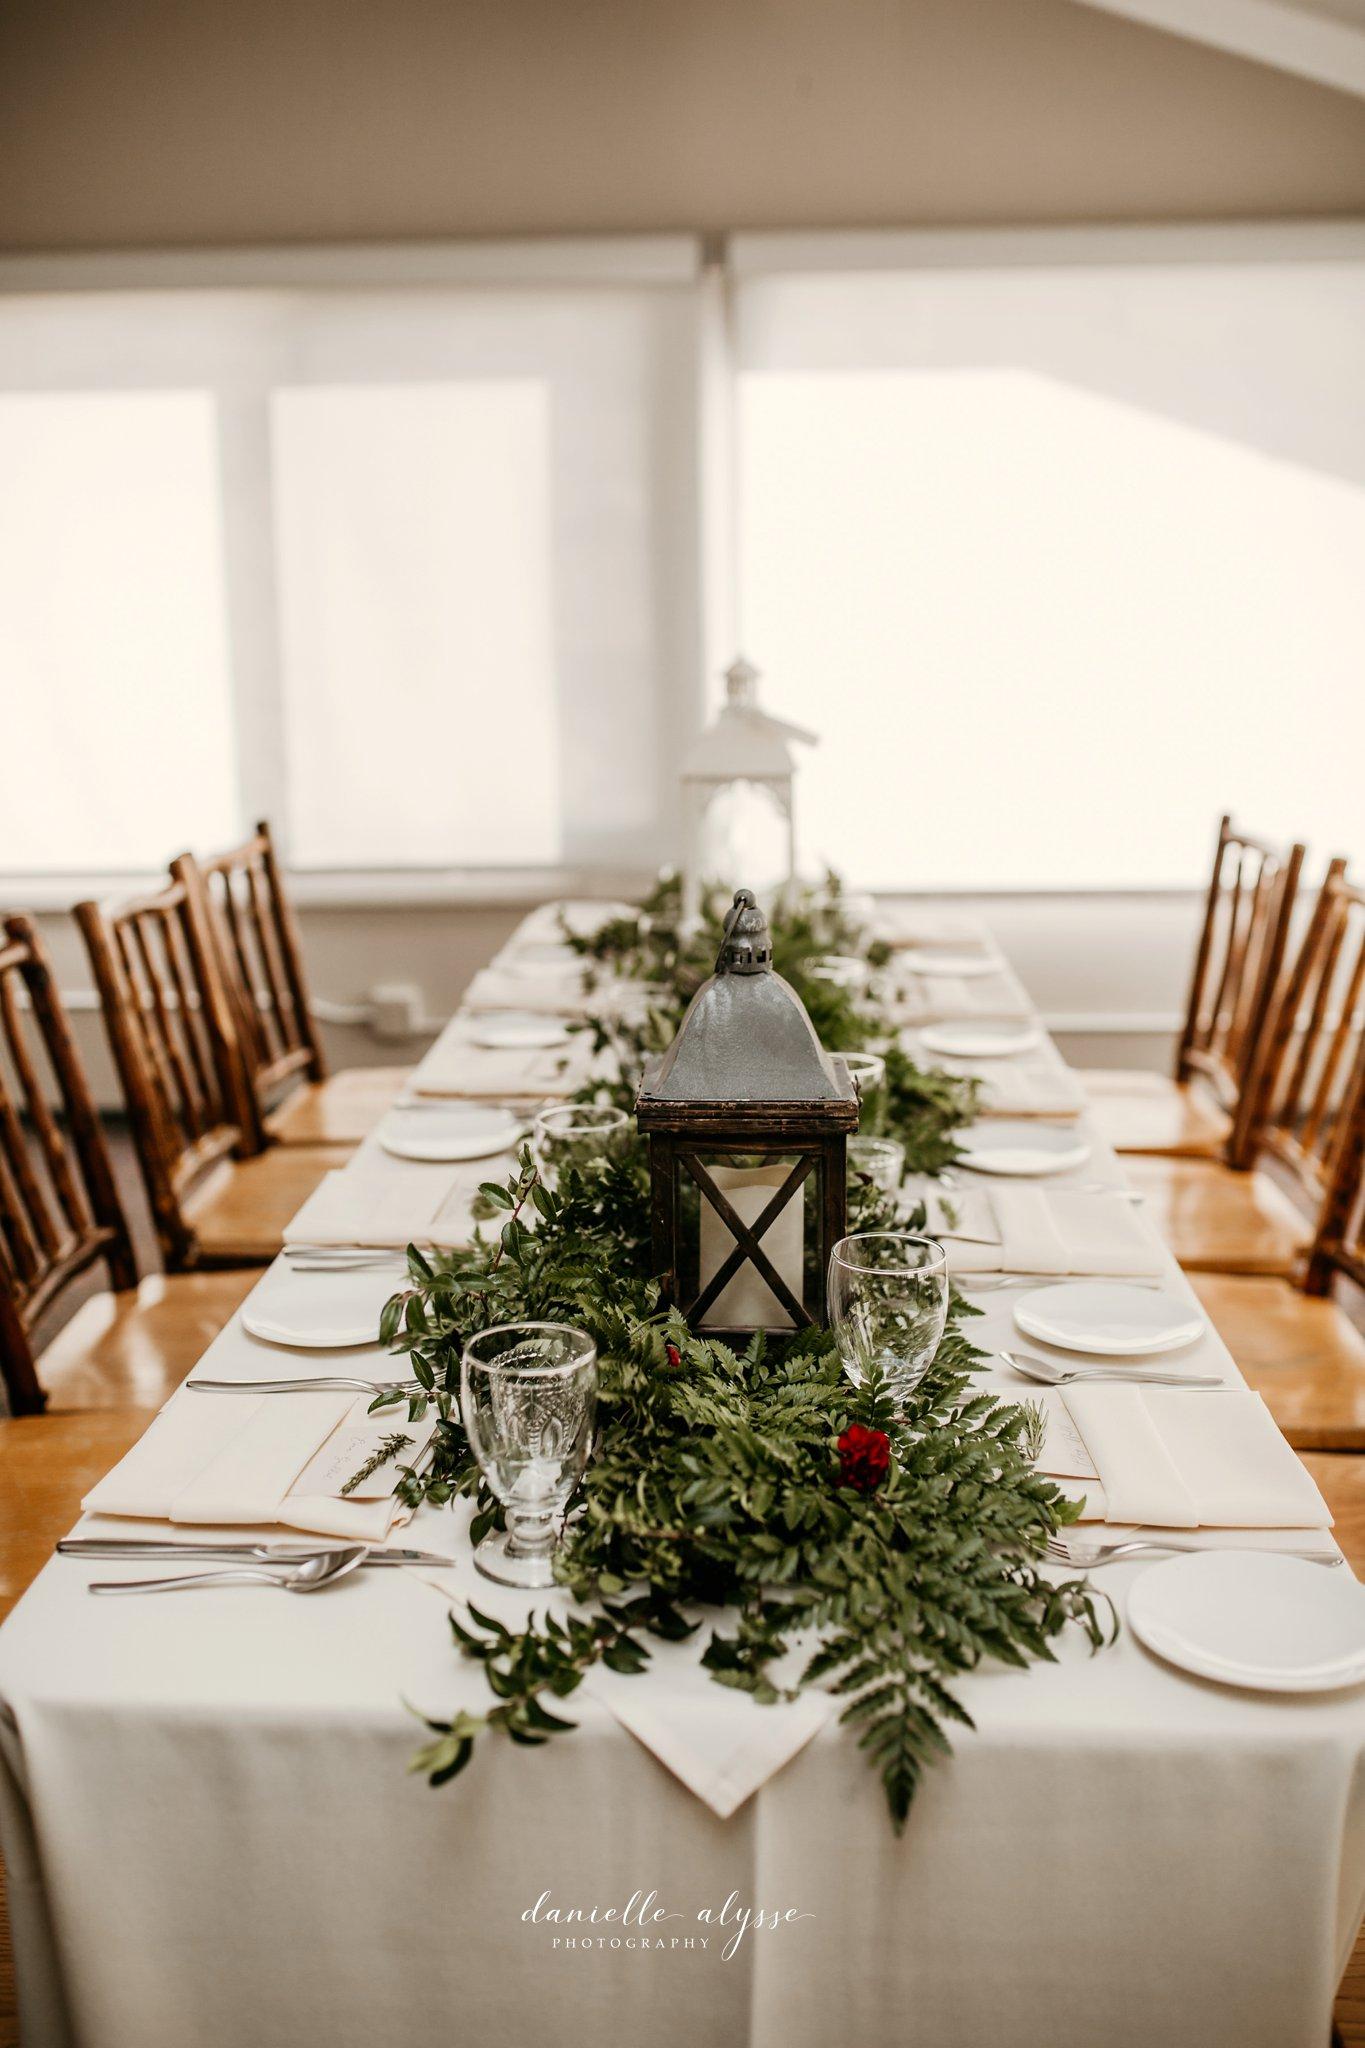 180831_wedding_stephanie_heavenly_south_lake_tahoe_danielle_alysse_photography_destination_blog_515_WEB.jpg